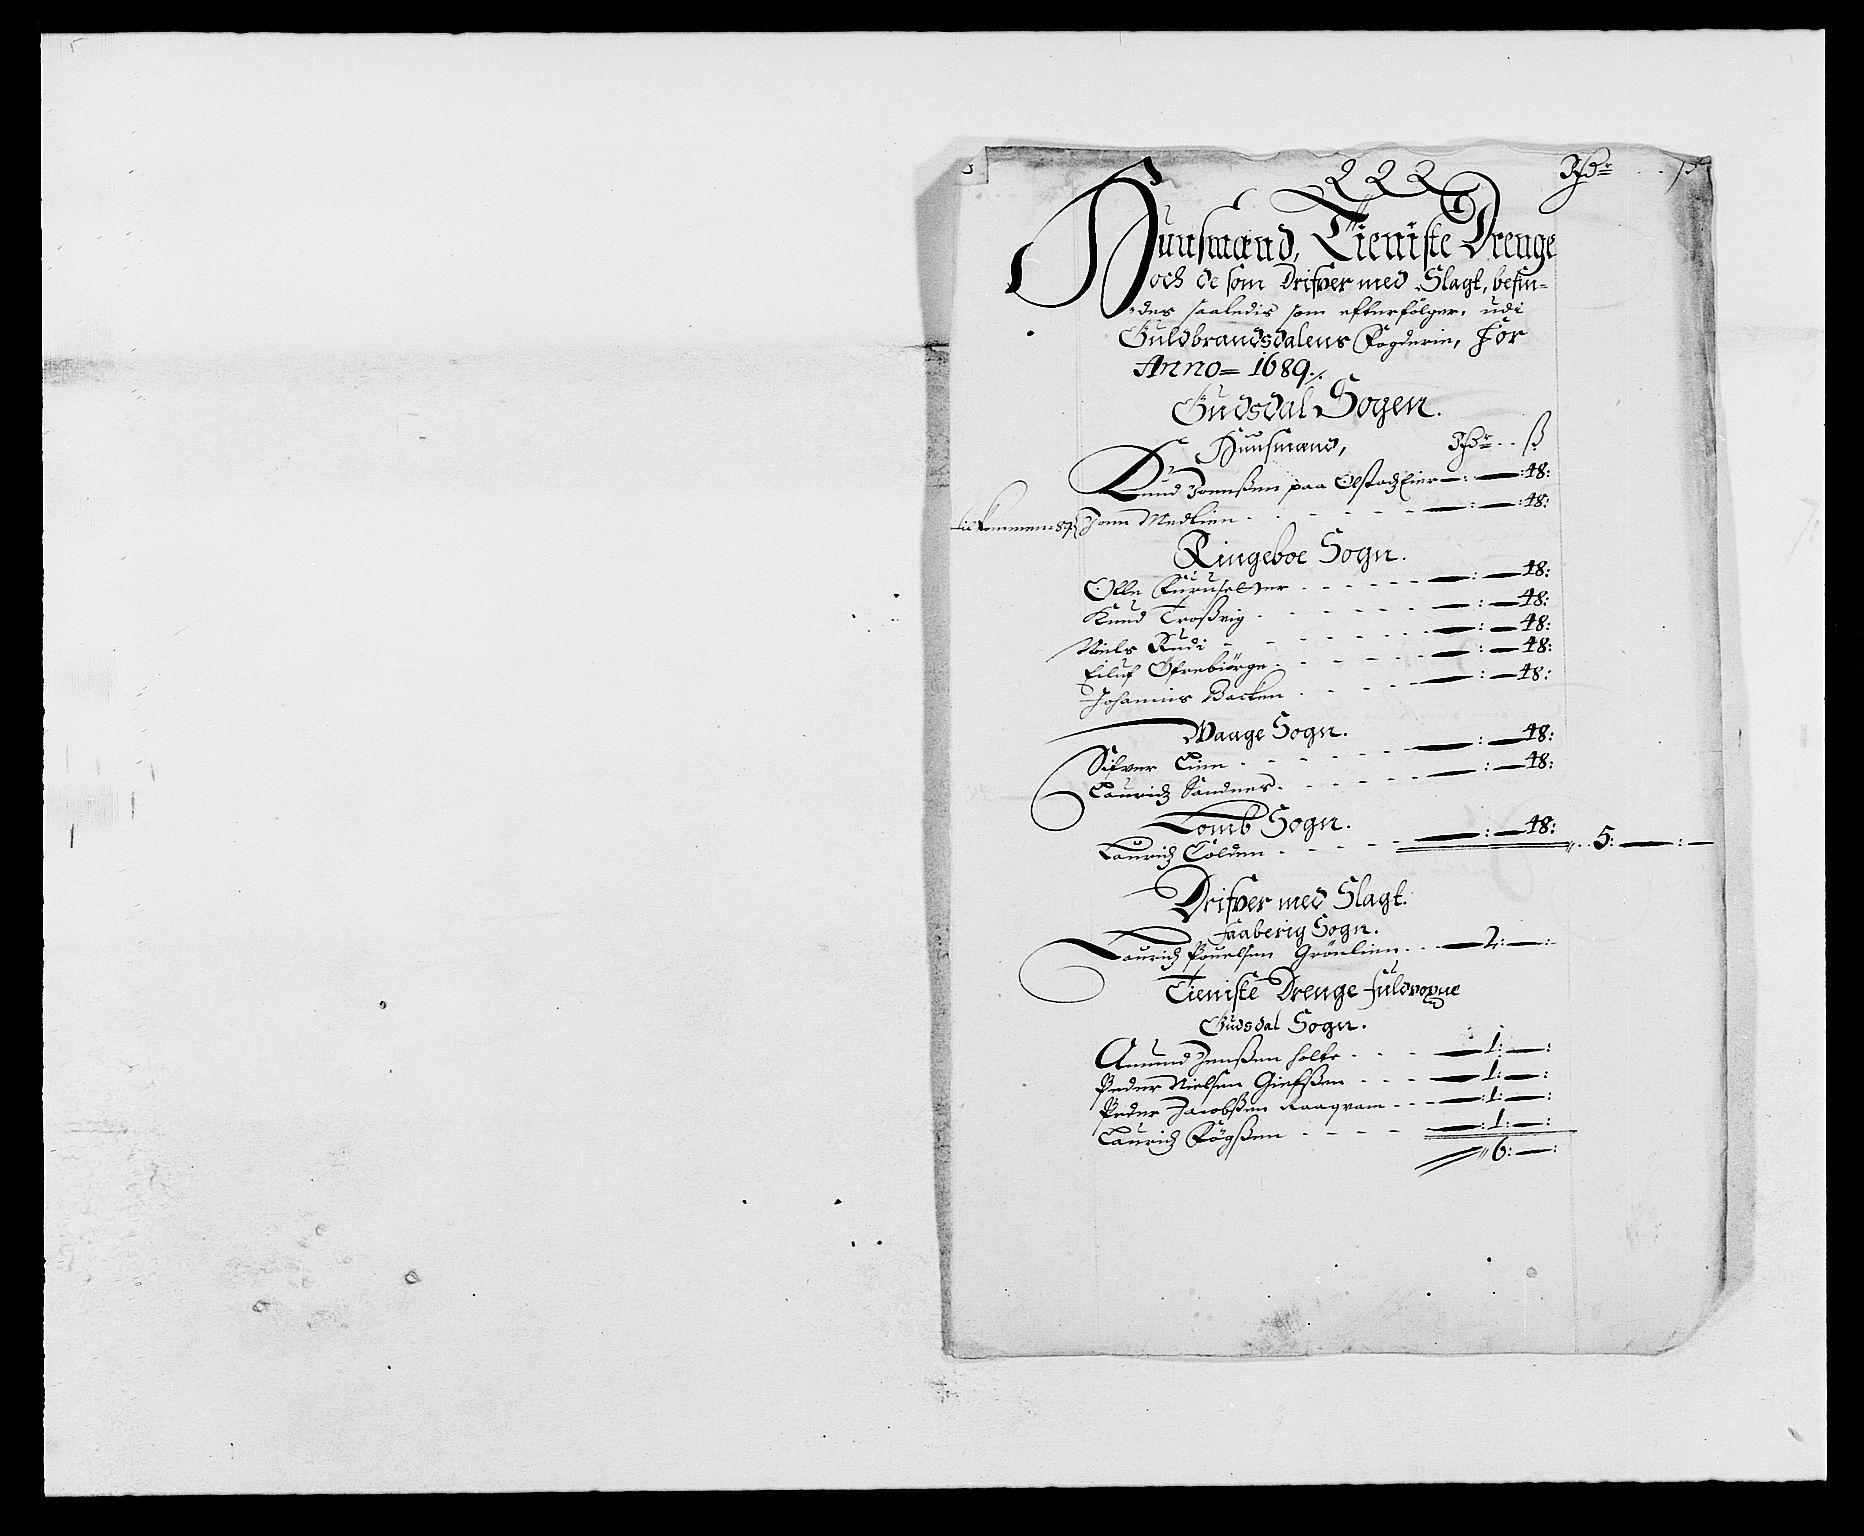 RA, Rentekammeret inntil 1814, Reviderte regnskaper, Fogderegnskap, R17/L1164: Fogderegnskap Gudbrandsdal, 1682-1689, s. 136